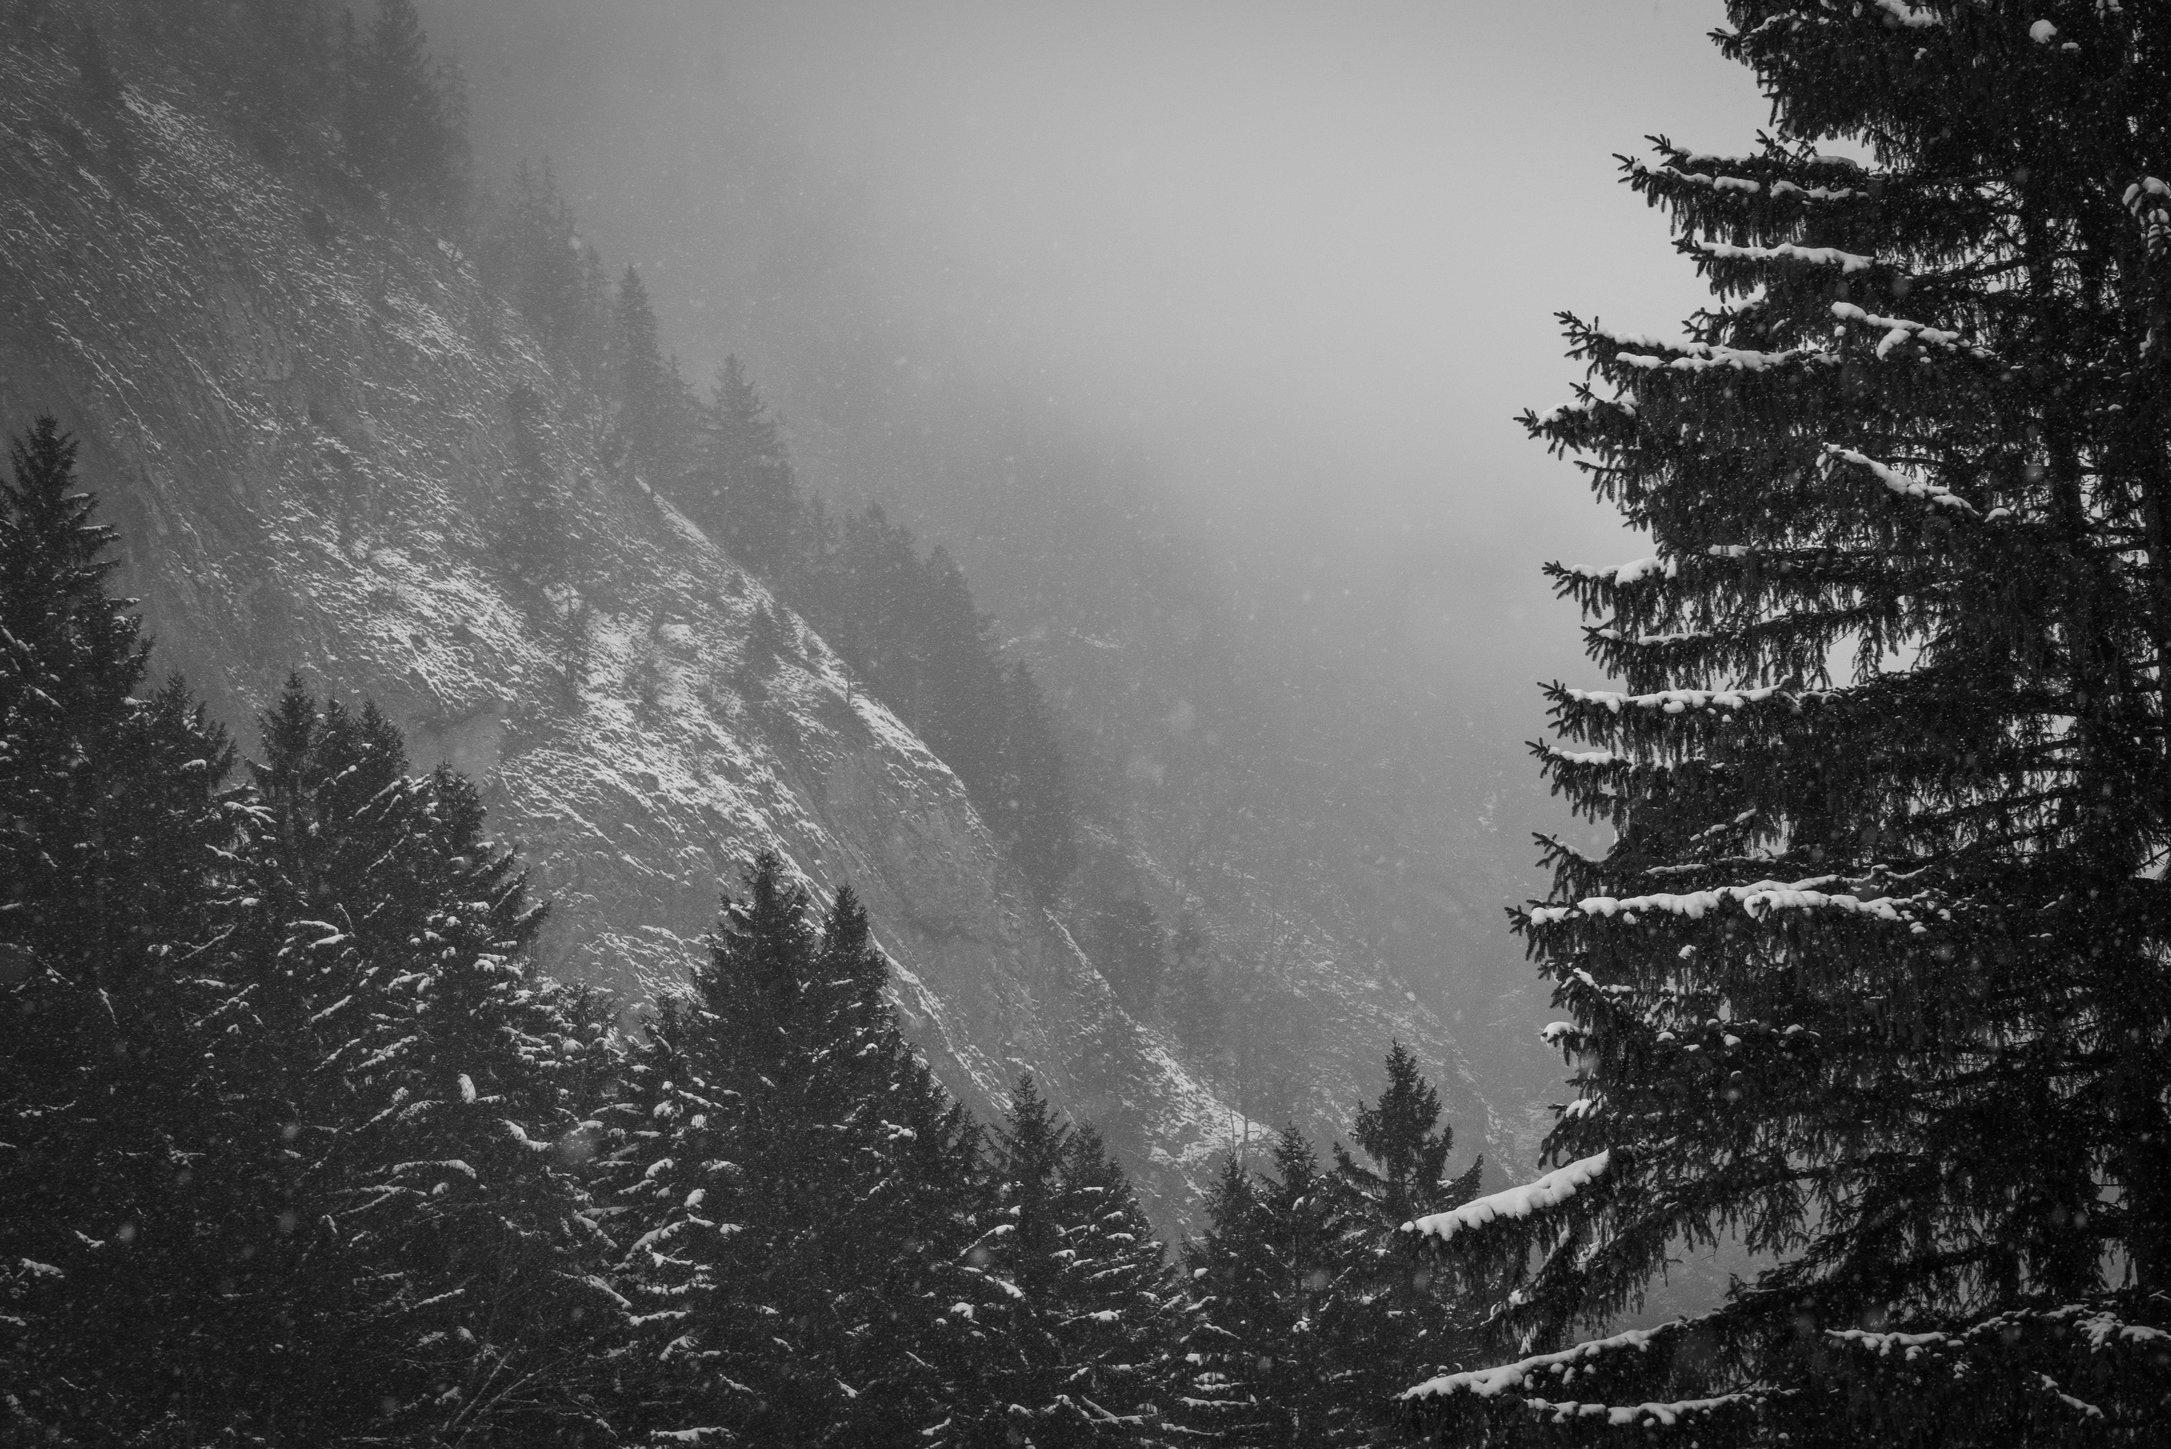 Appenzell im Nebel